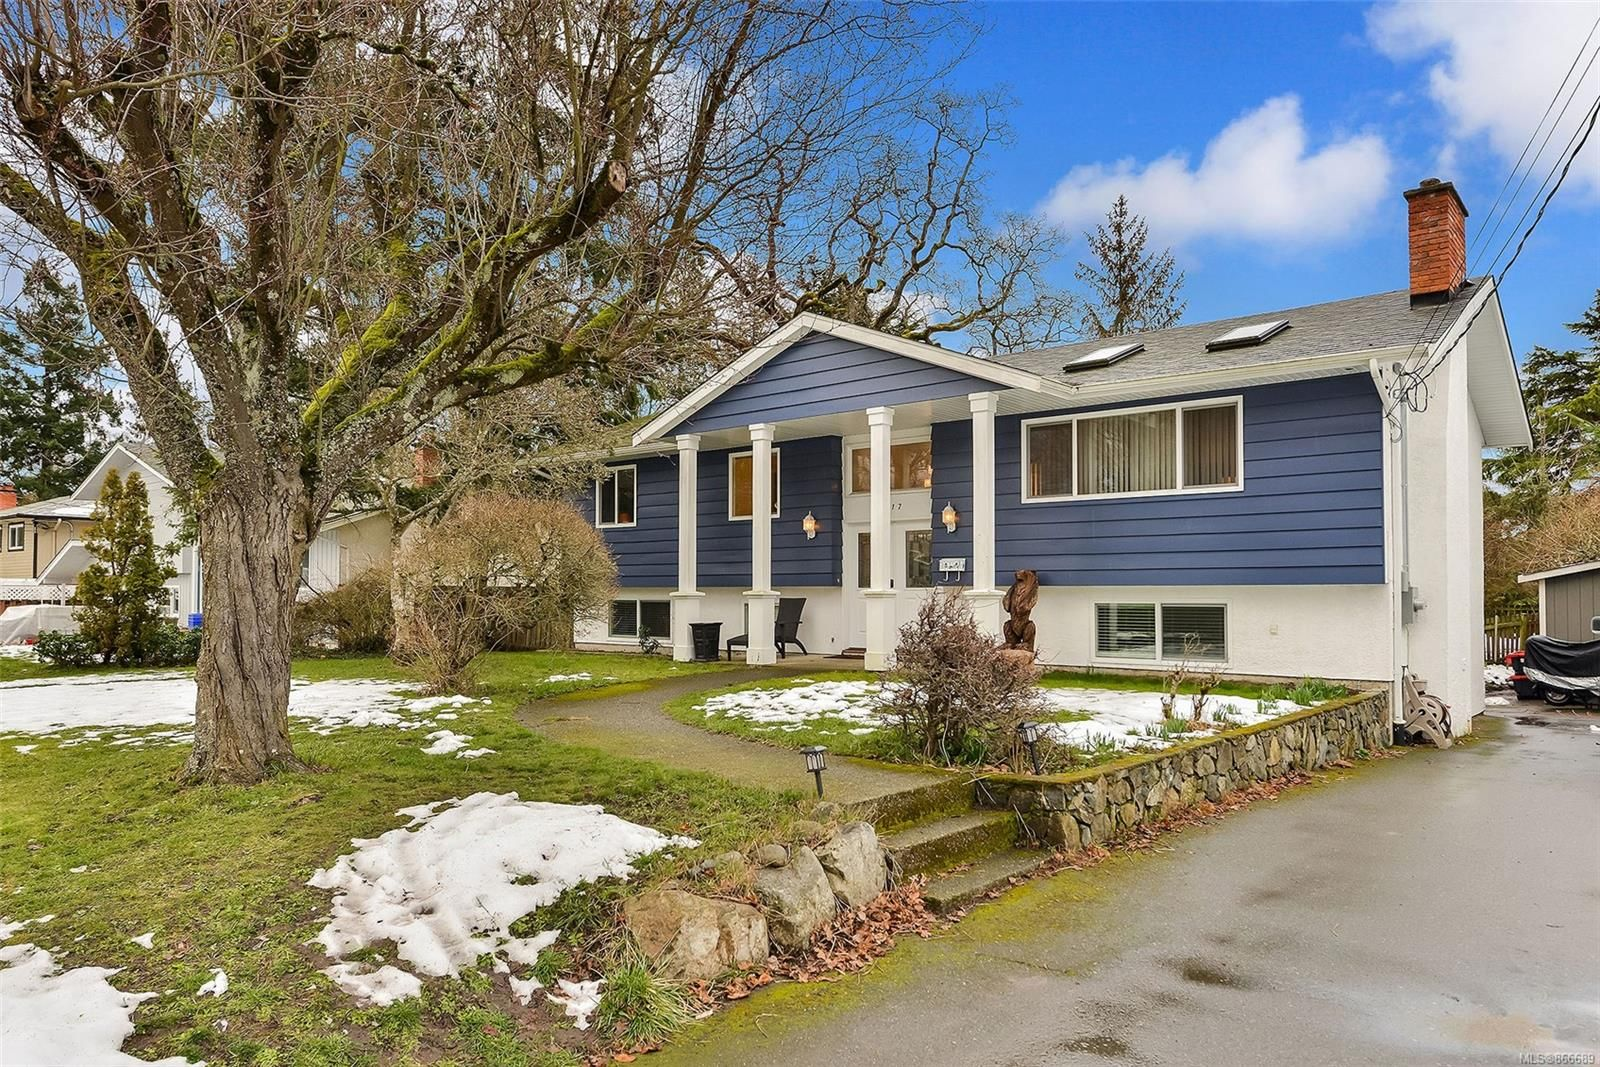 Main Photo: 1717 Jefferson Ave in : SE Mt Doug House for sale (Saanich East)  : MLS®# 866689